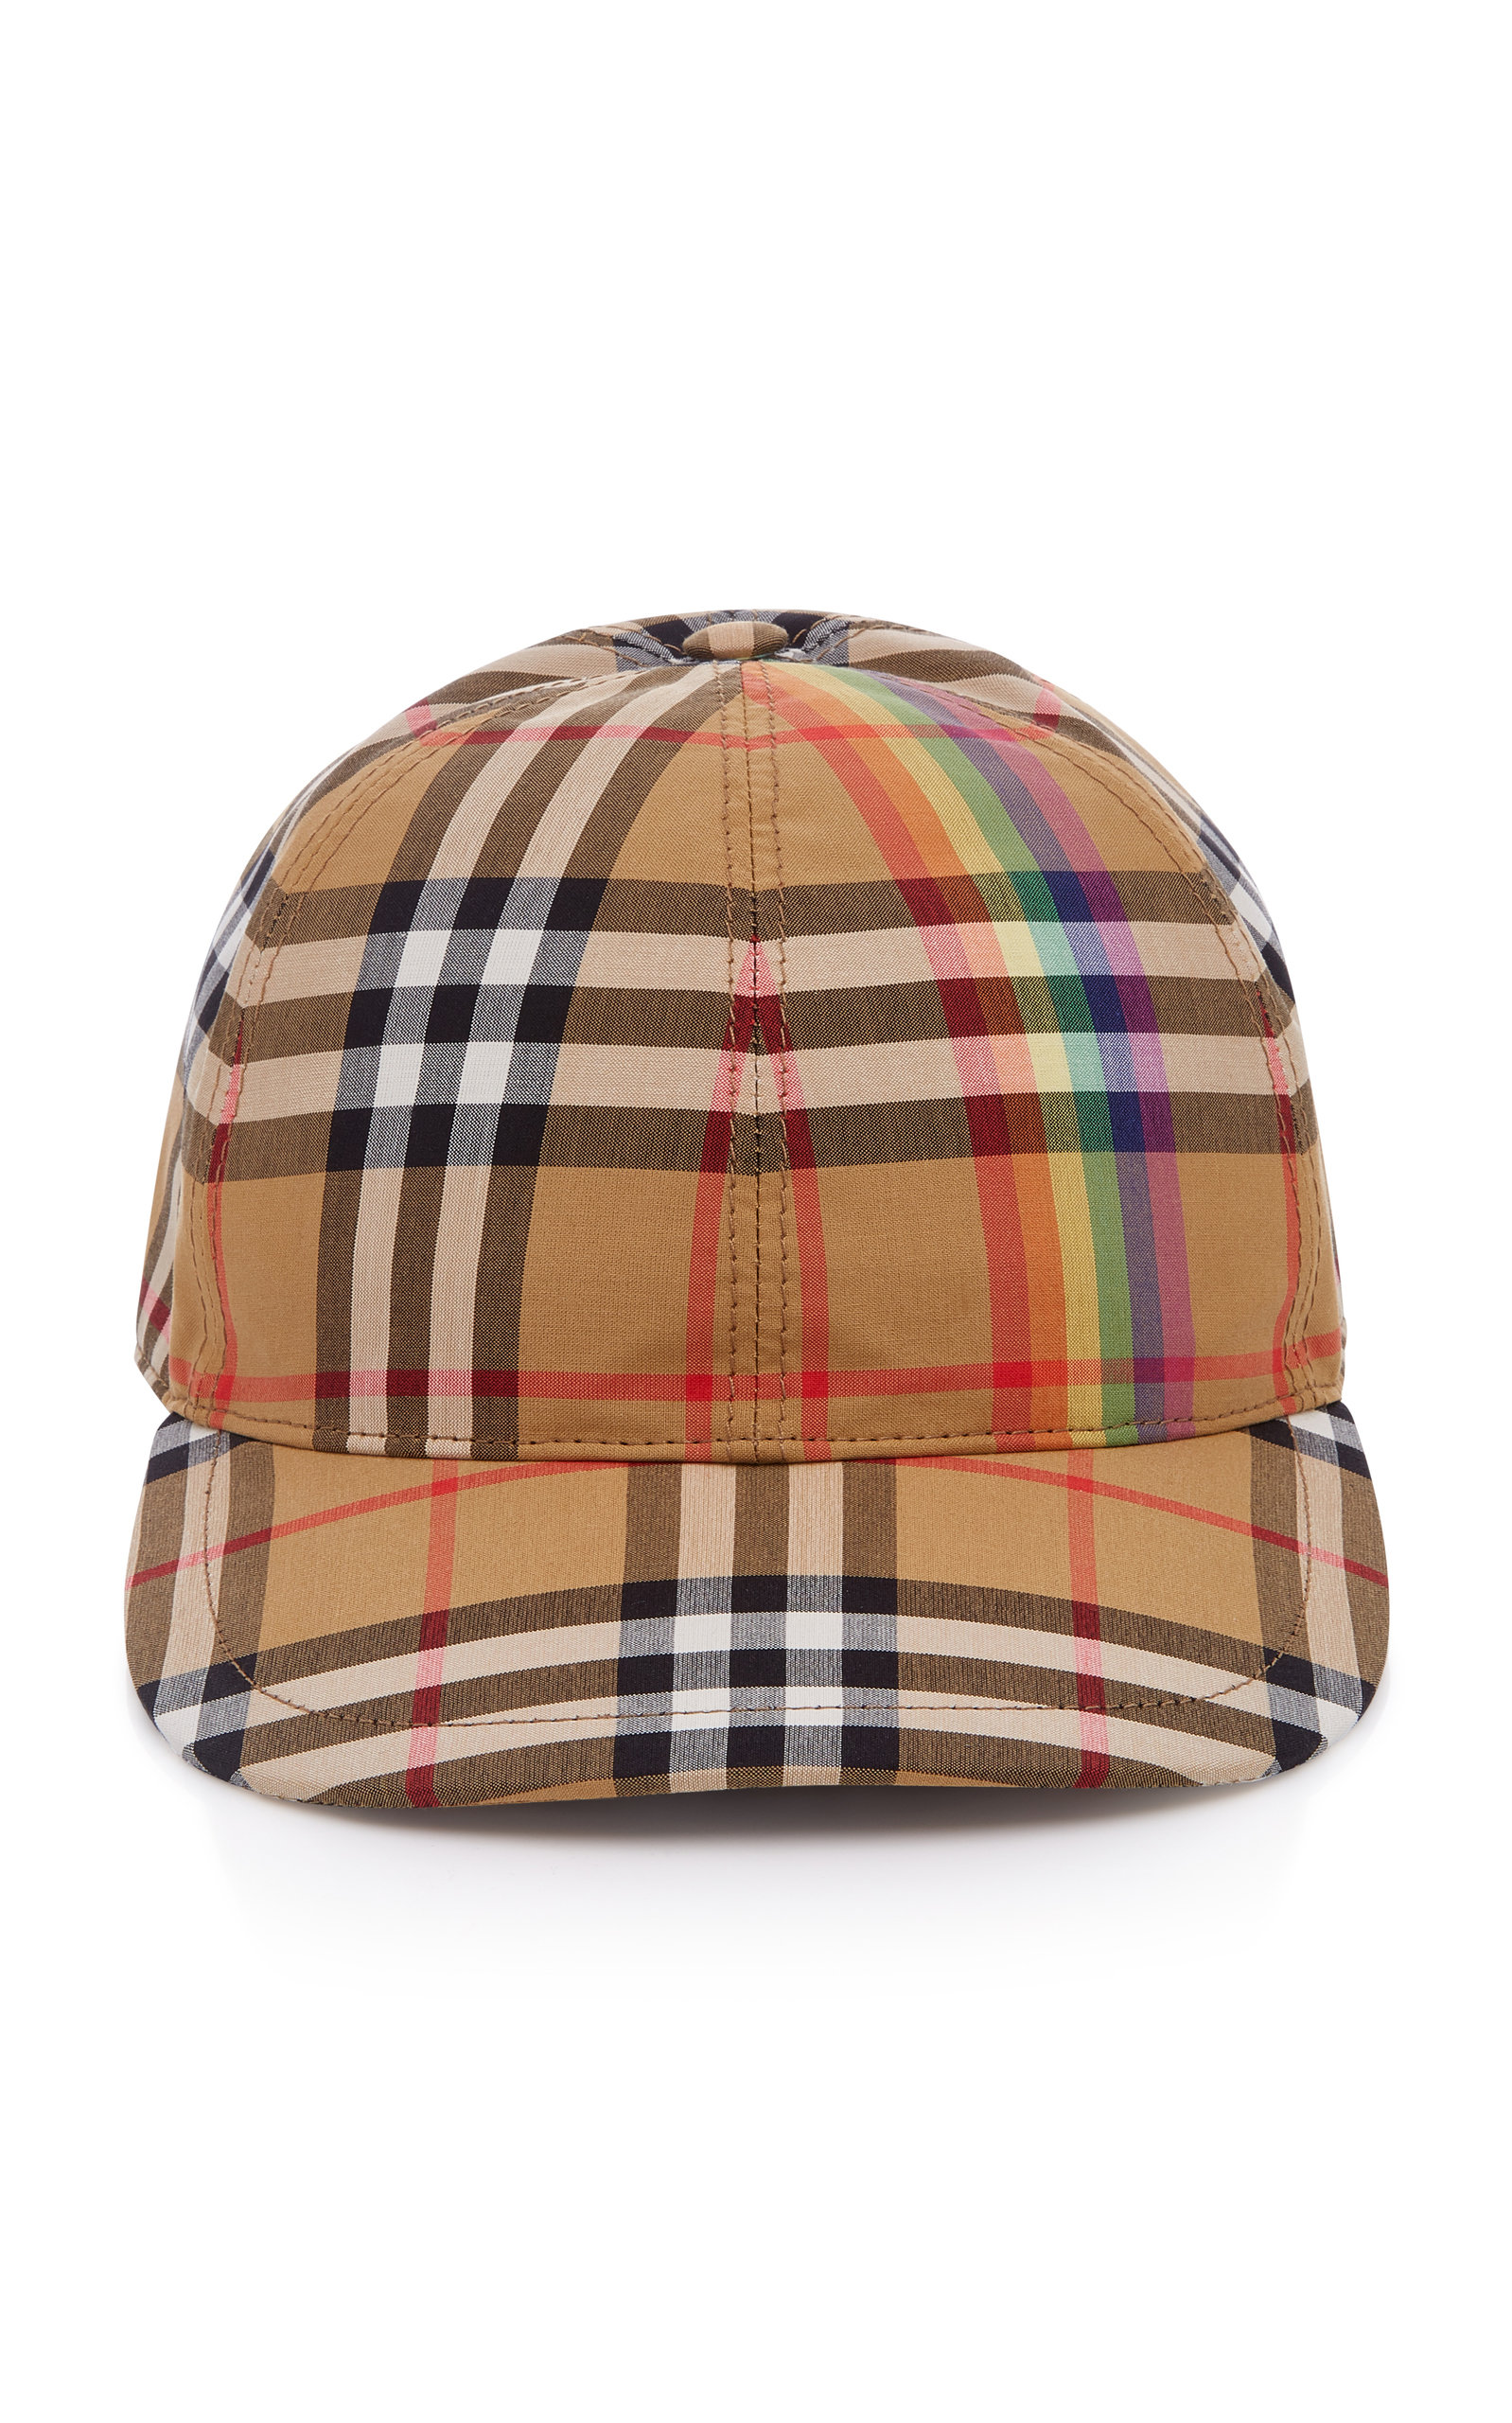 ab0daf0c142 BurberryPlaid Baseball Hat. CLOSE. Loading